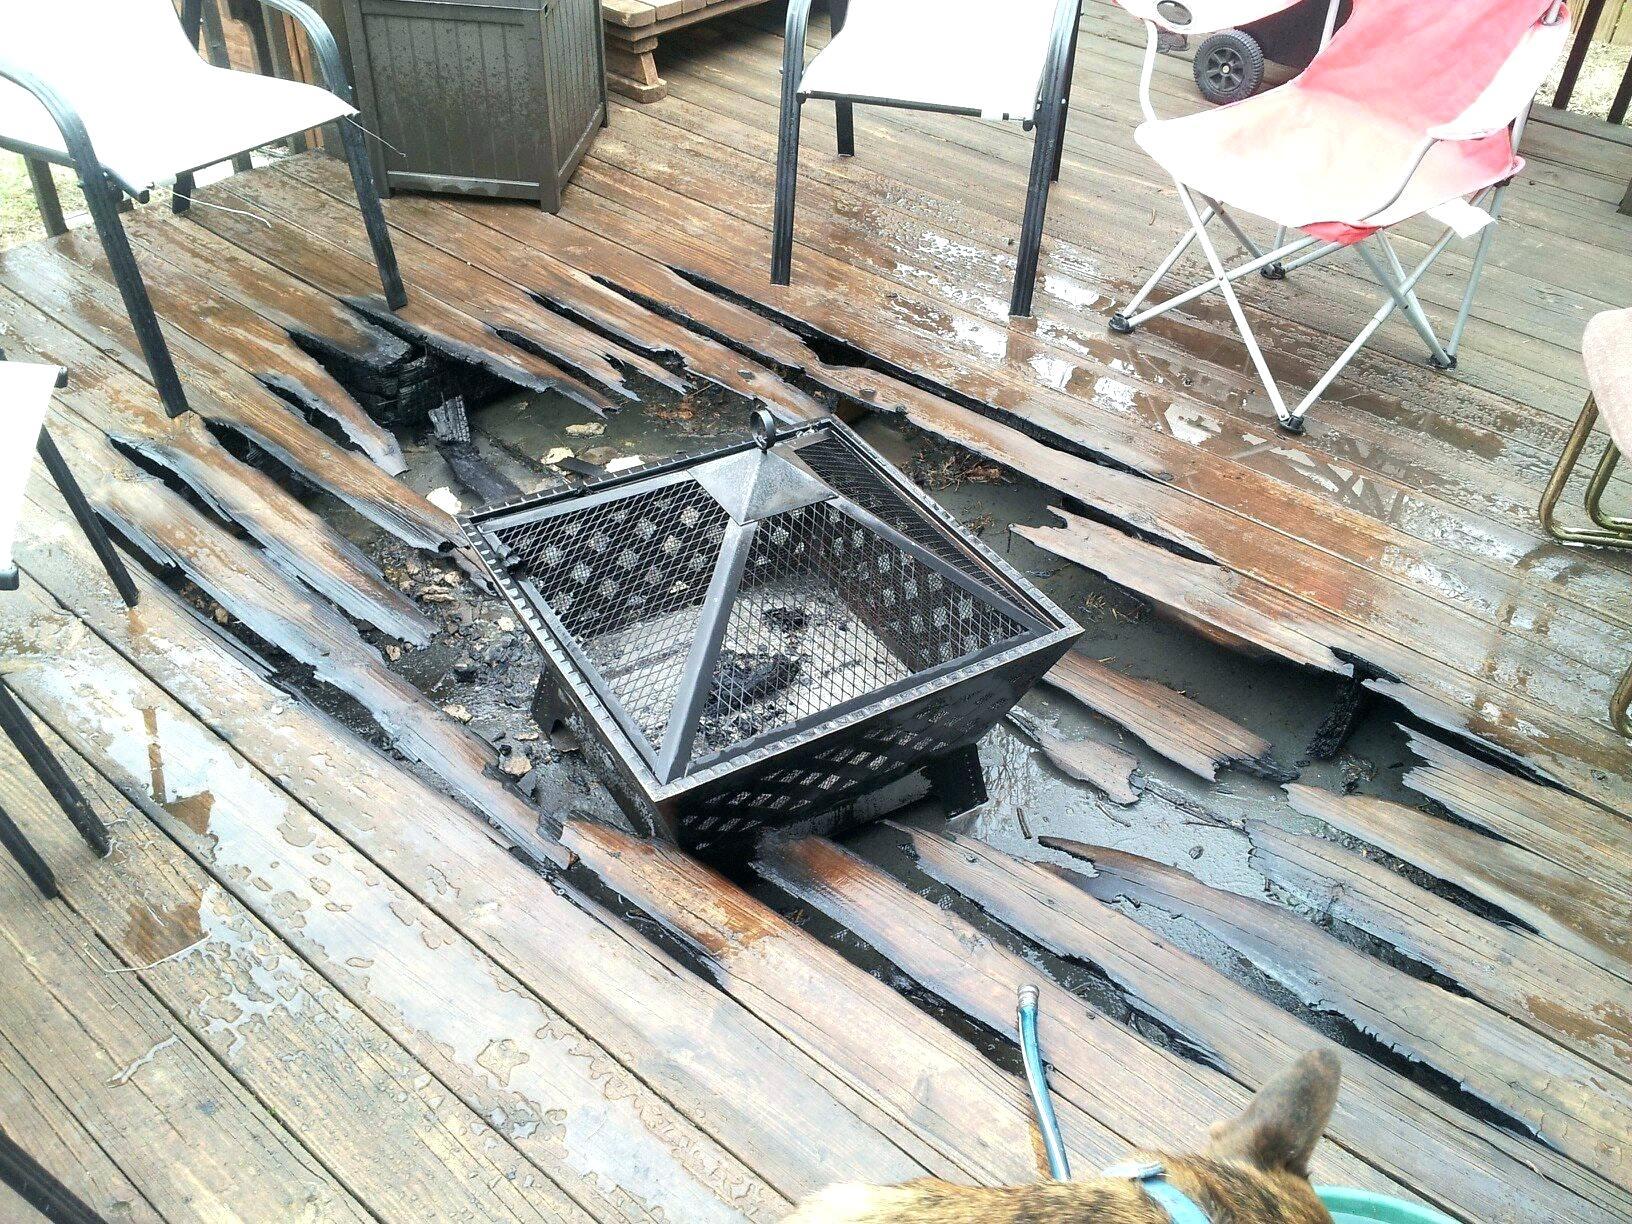 Fire Pit On Wooden Deck Decks Ideas pertaining to measurements 1632 X 1224